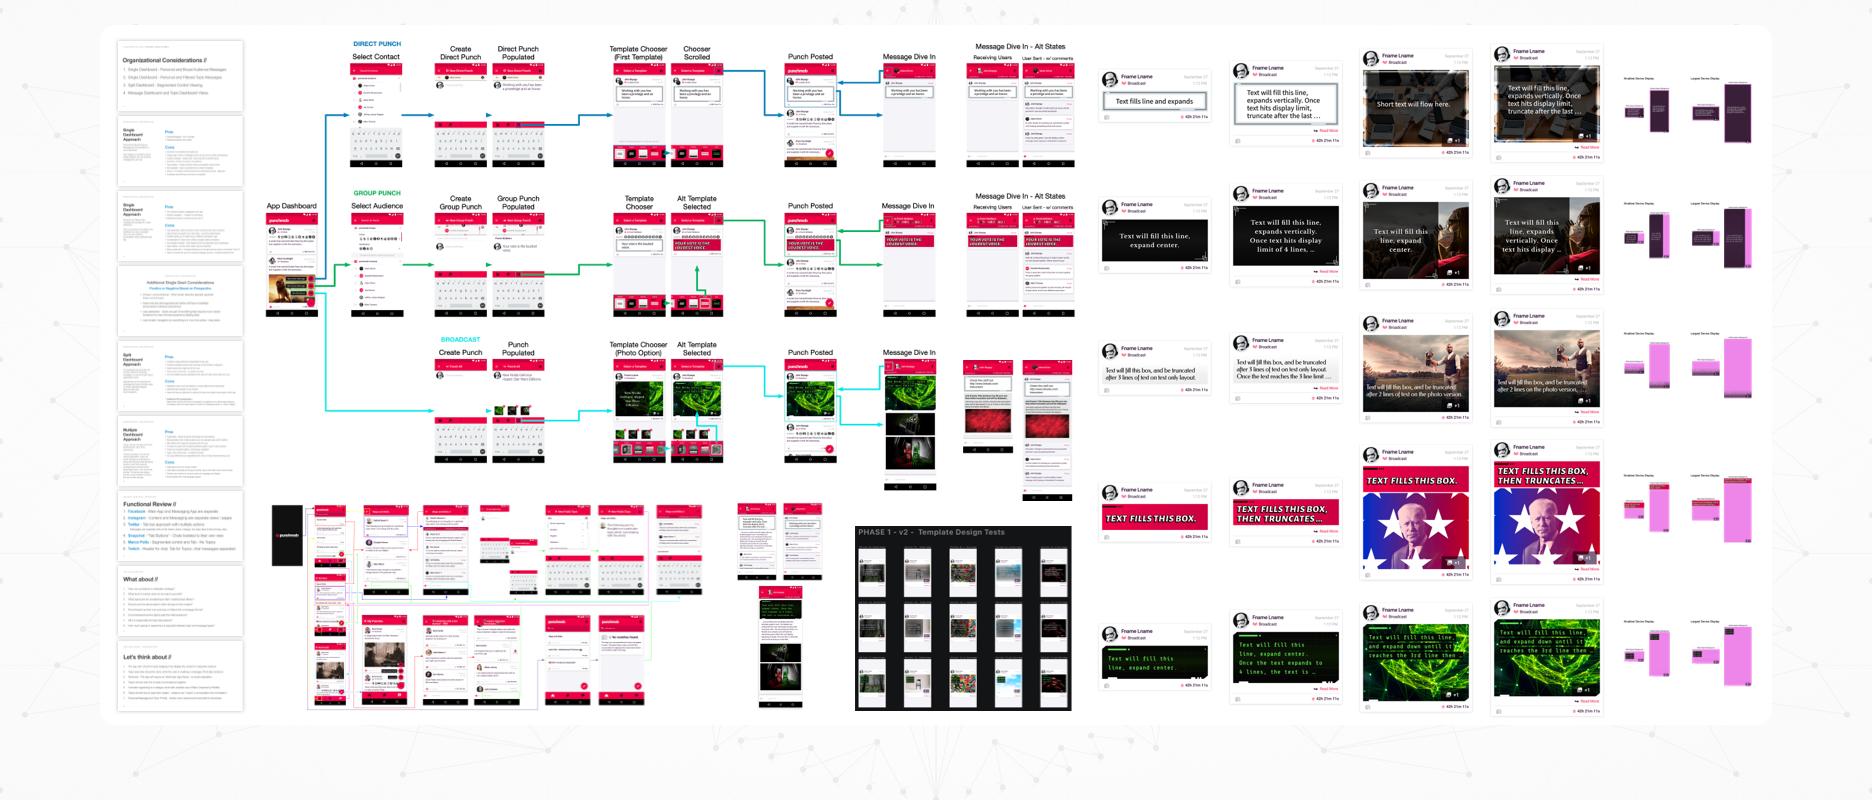 Punchmob - Case Study Image - Phase 2 Templates